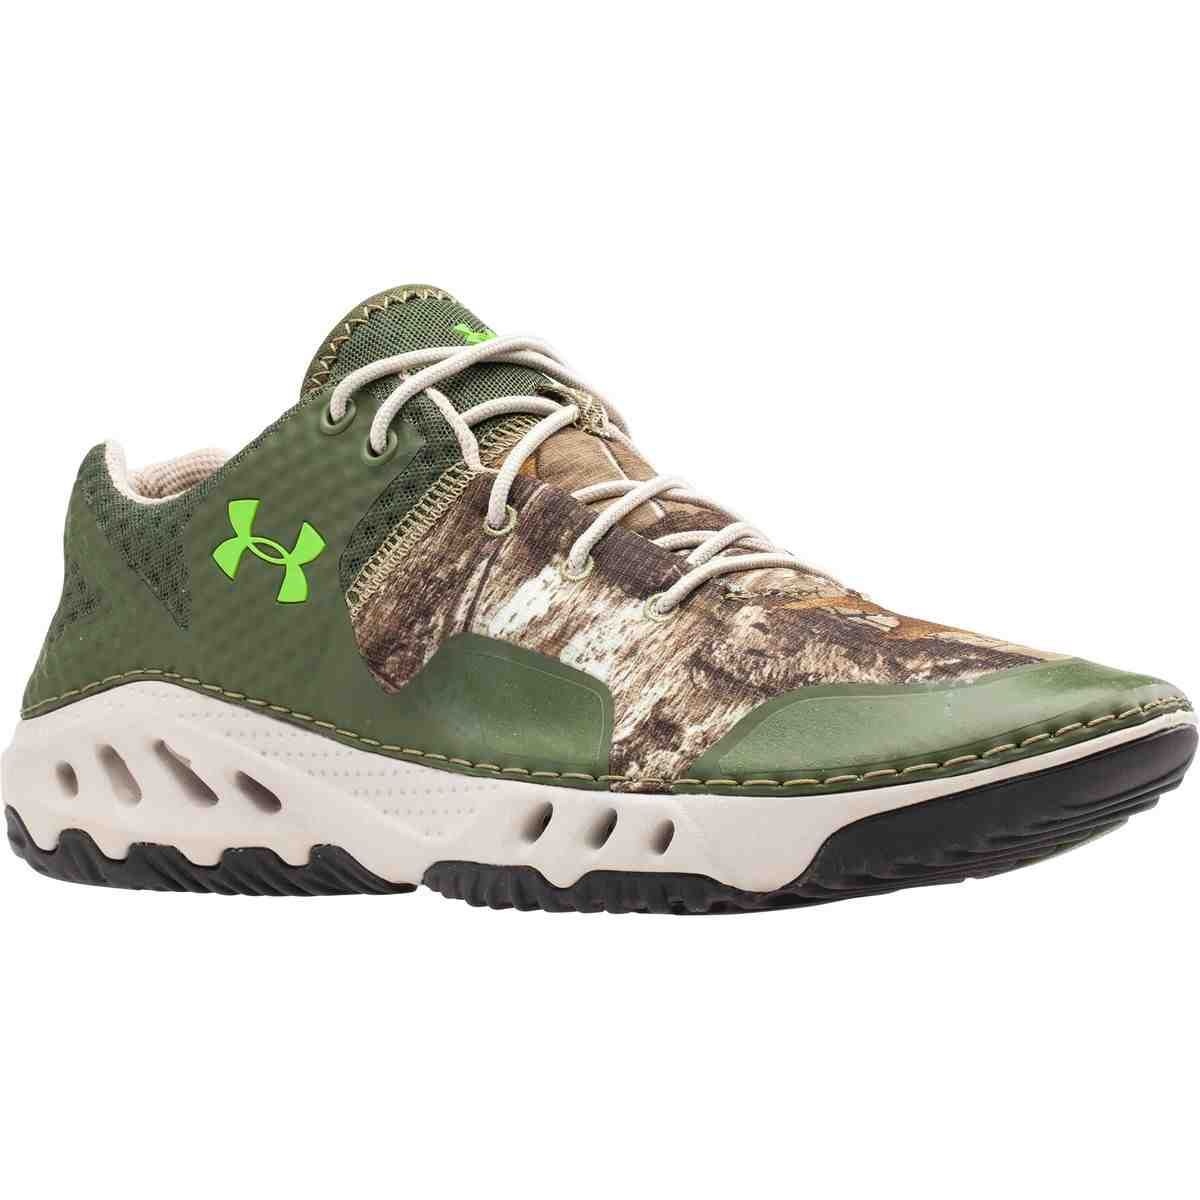 Under-Armour-Mens-Tennis-Shoes.jpg